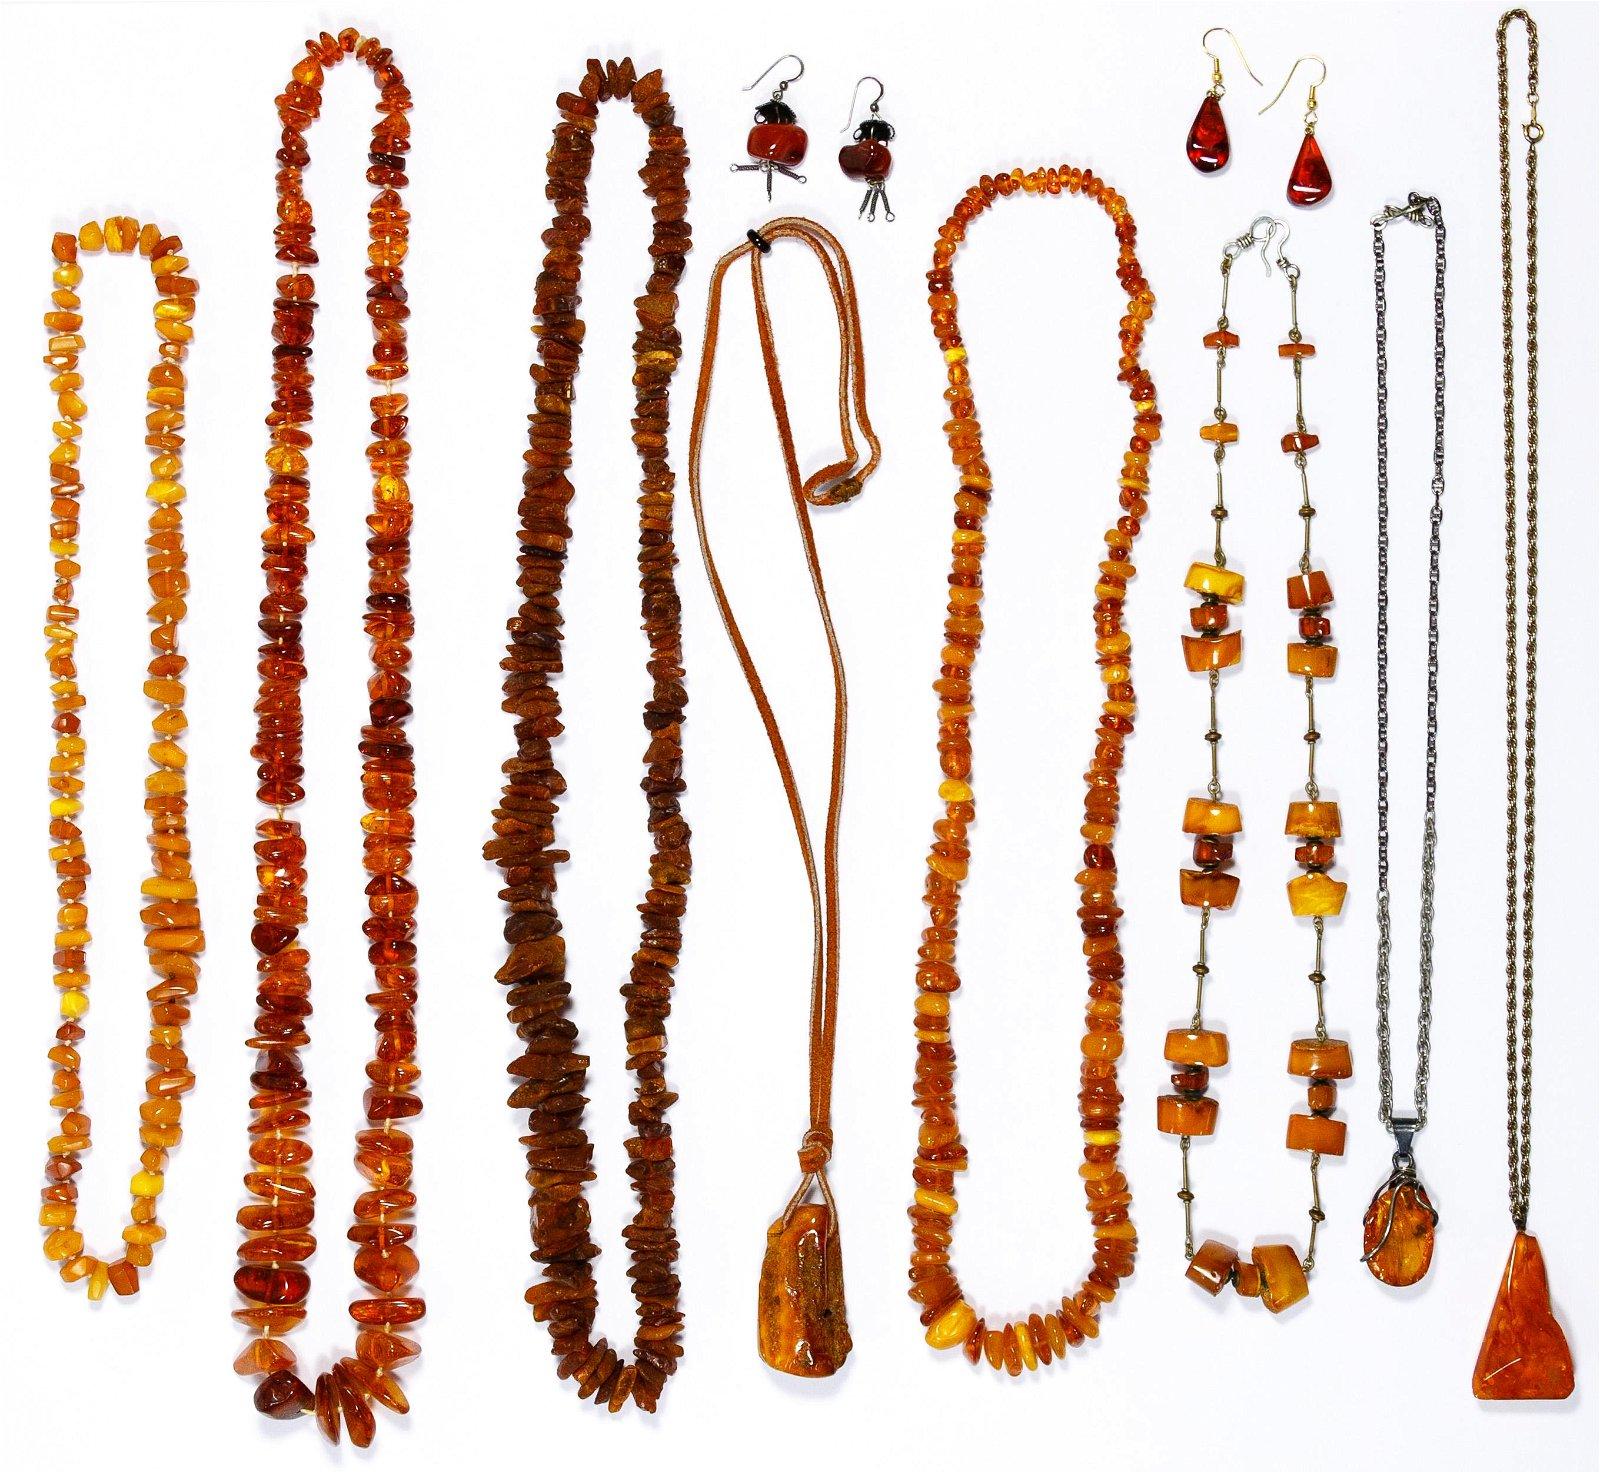 Amber Jewelry Assortment